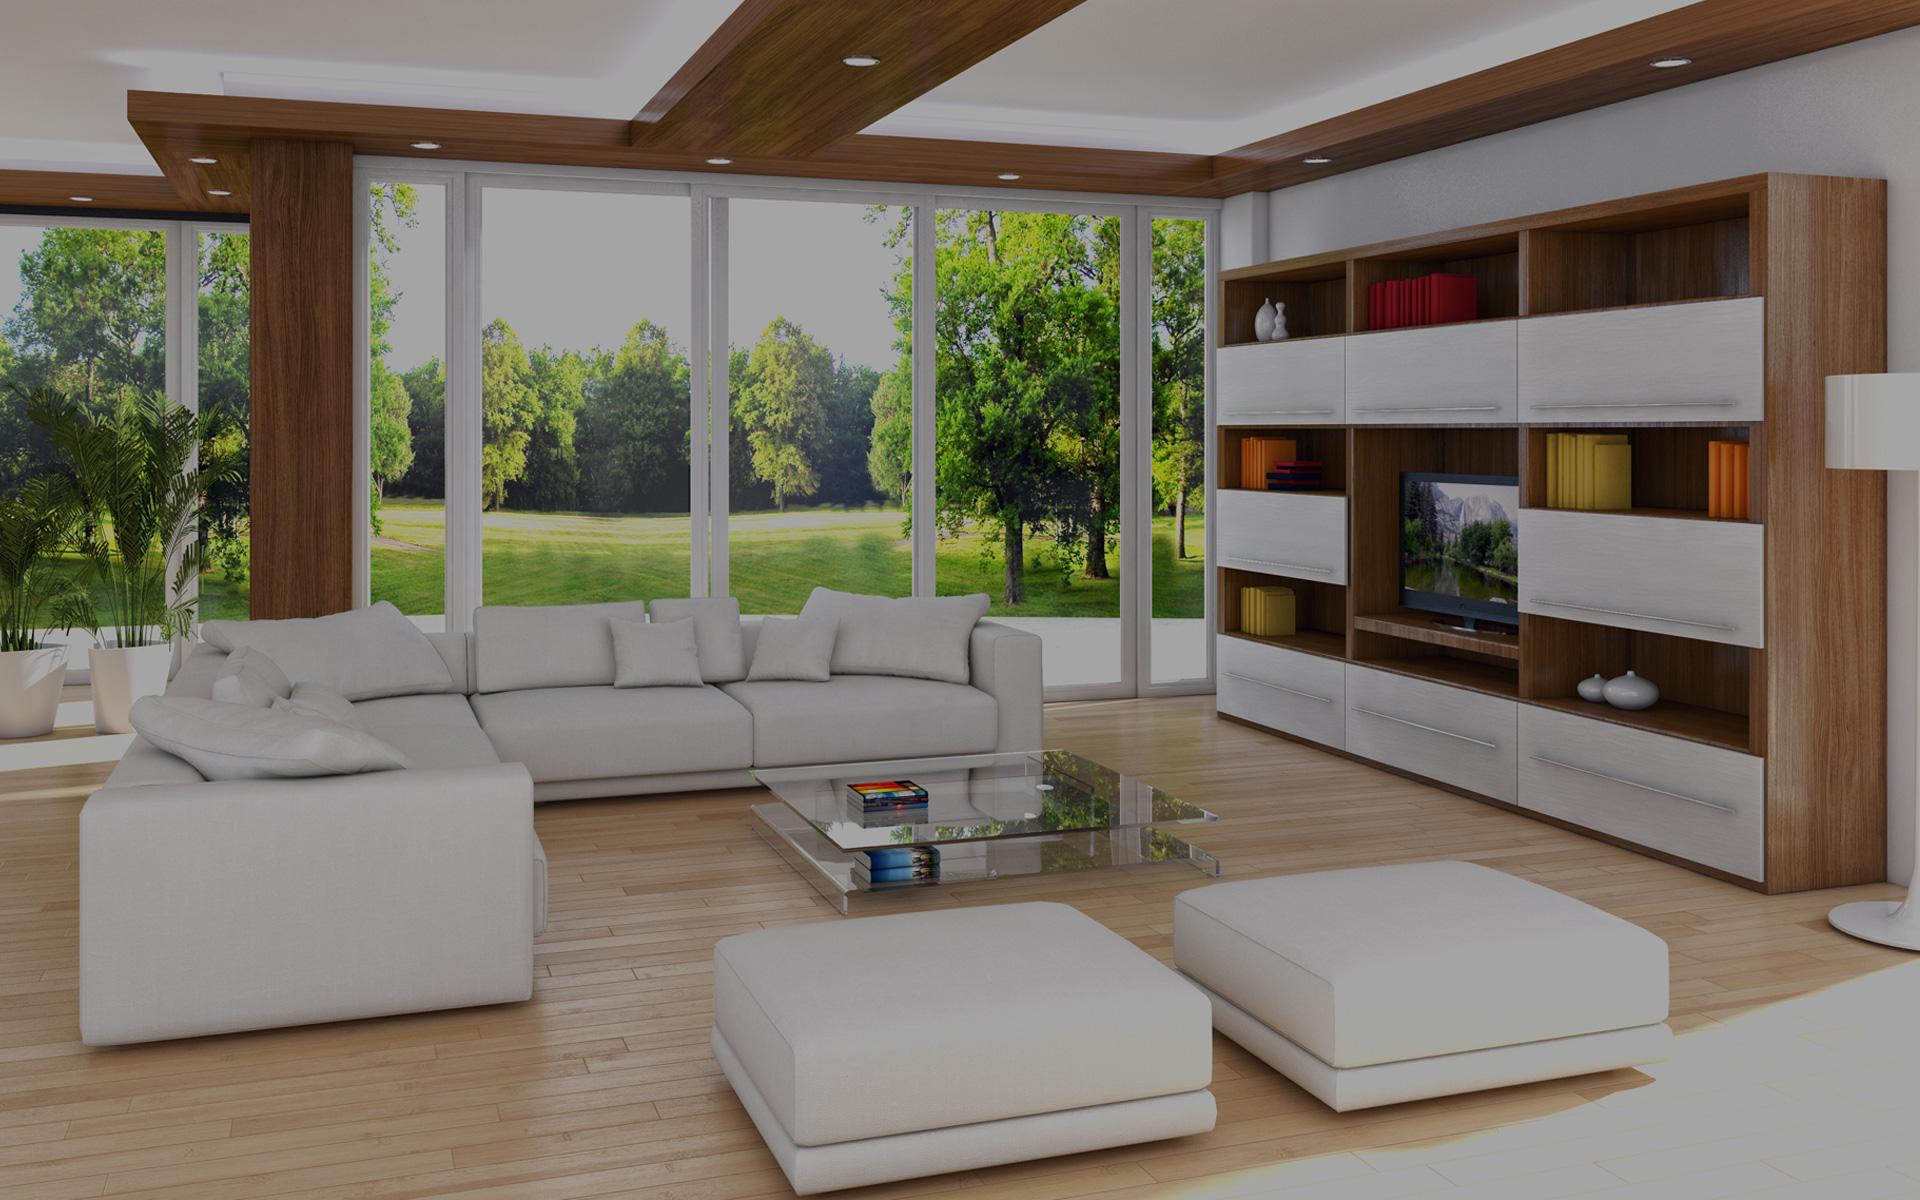 Tecnologie per la casa intelligente